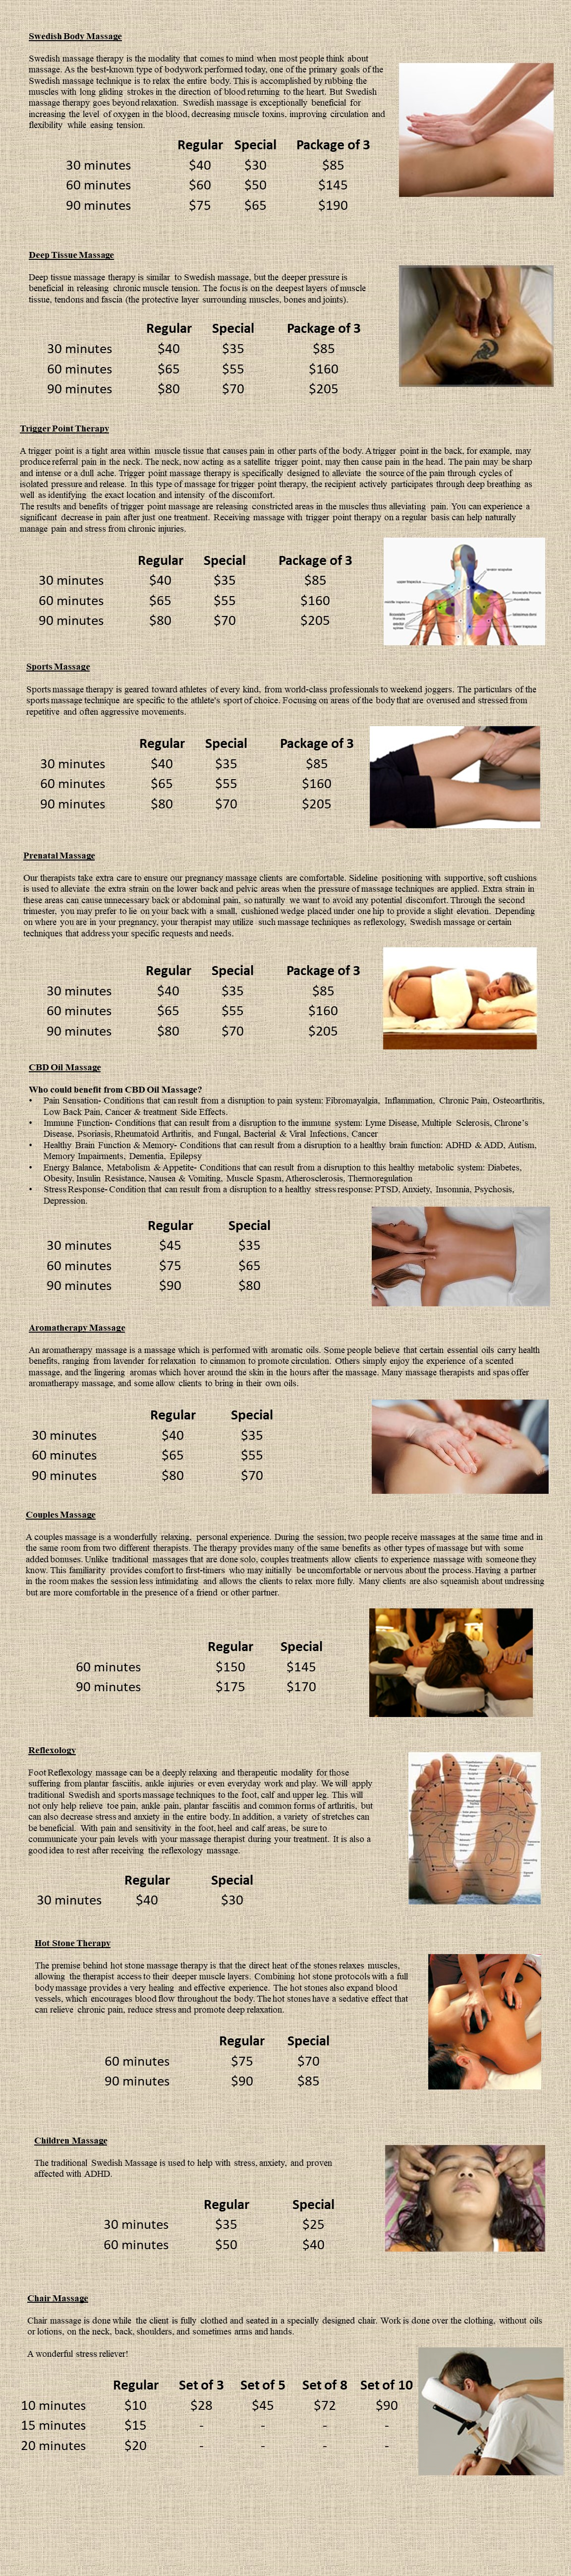 massage-services-2019-holiday.jpg